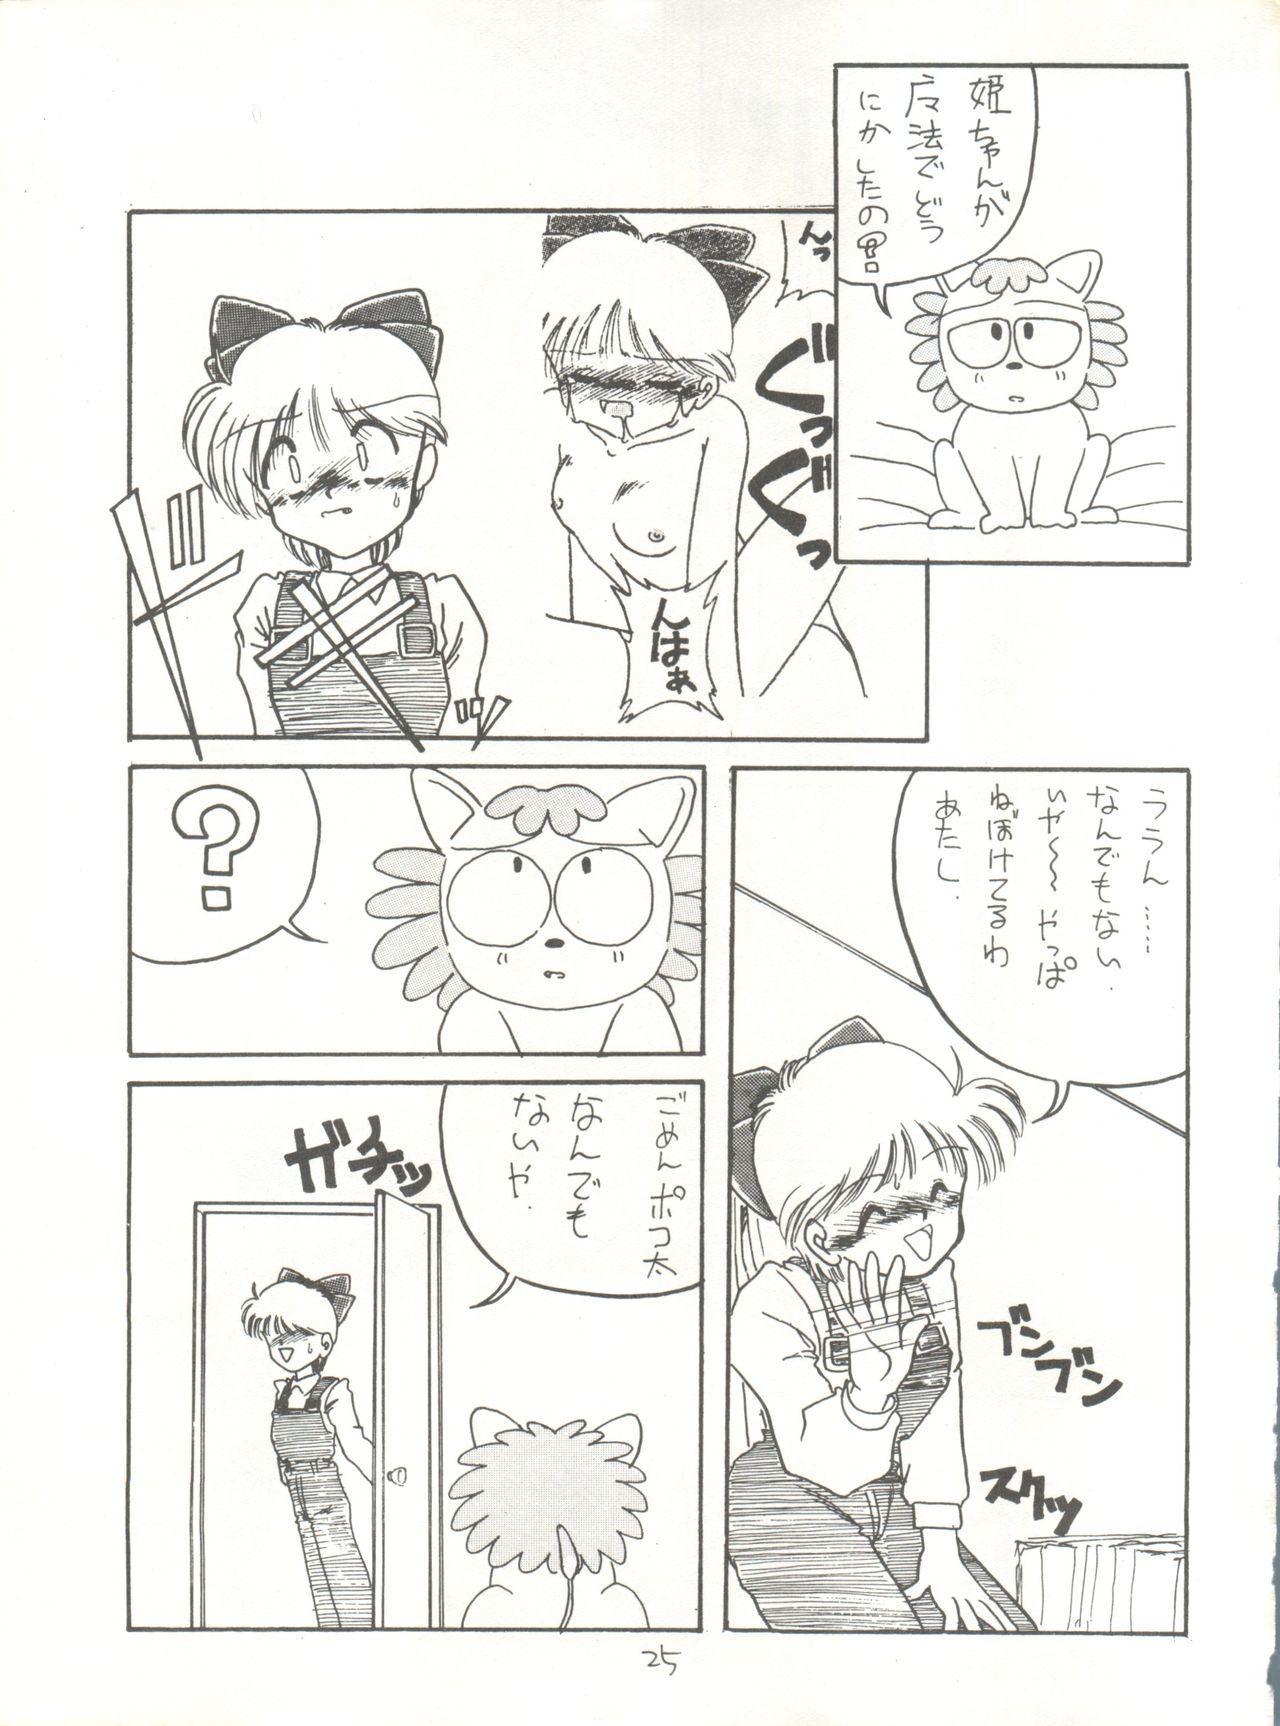 [Global One (MARO)] Sadistic 5 (Cutey Honey, Devilman, Sailor Moon), [Global One (MARO)] Sadistic (Dirty Pair, Fushigi no Umi no Nadia, Sailor Moon), [Studio Ikkatsumajin] .ribbon (Hime-chan's Ribbon) 148